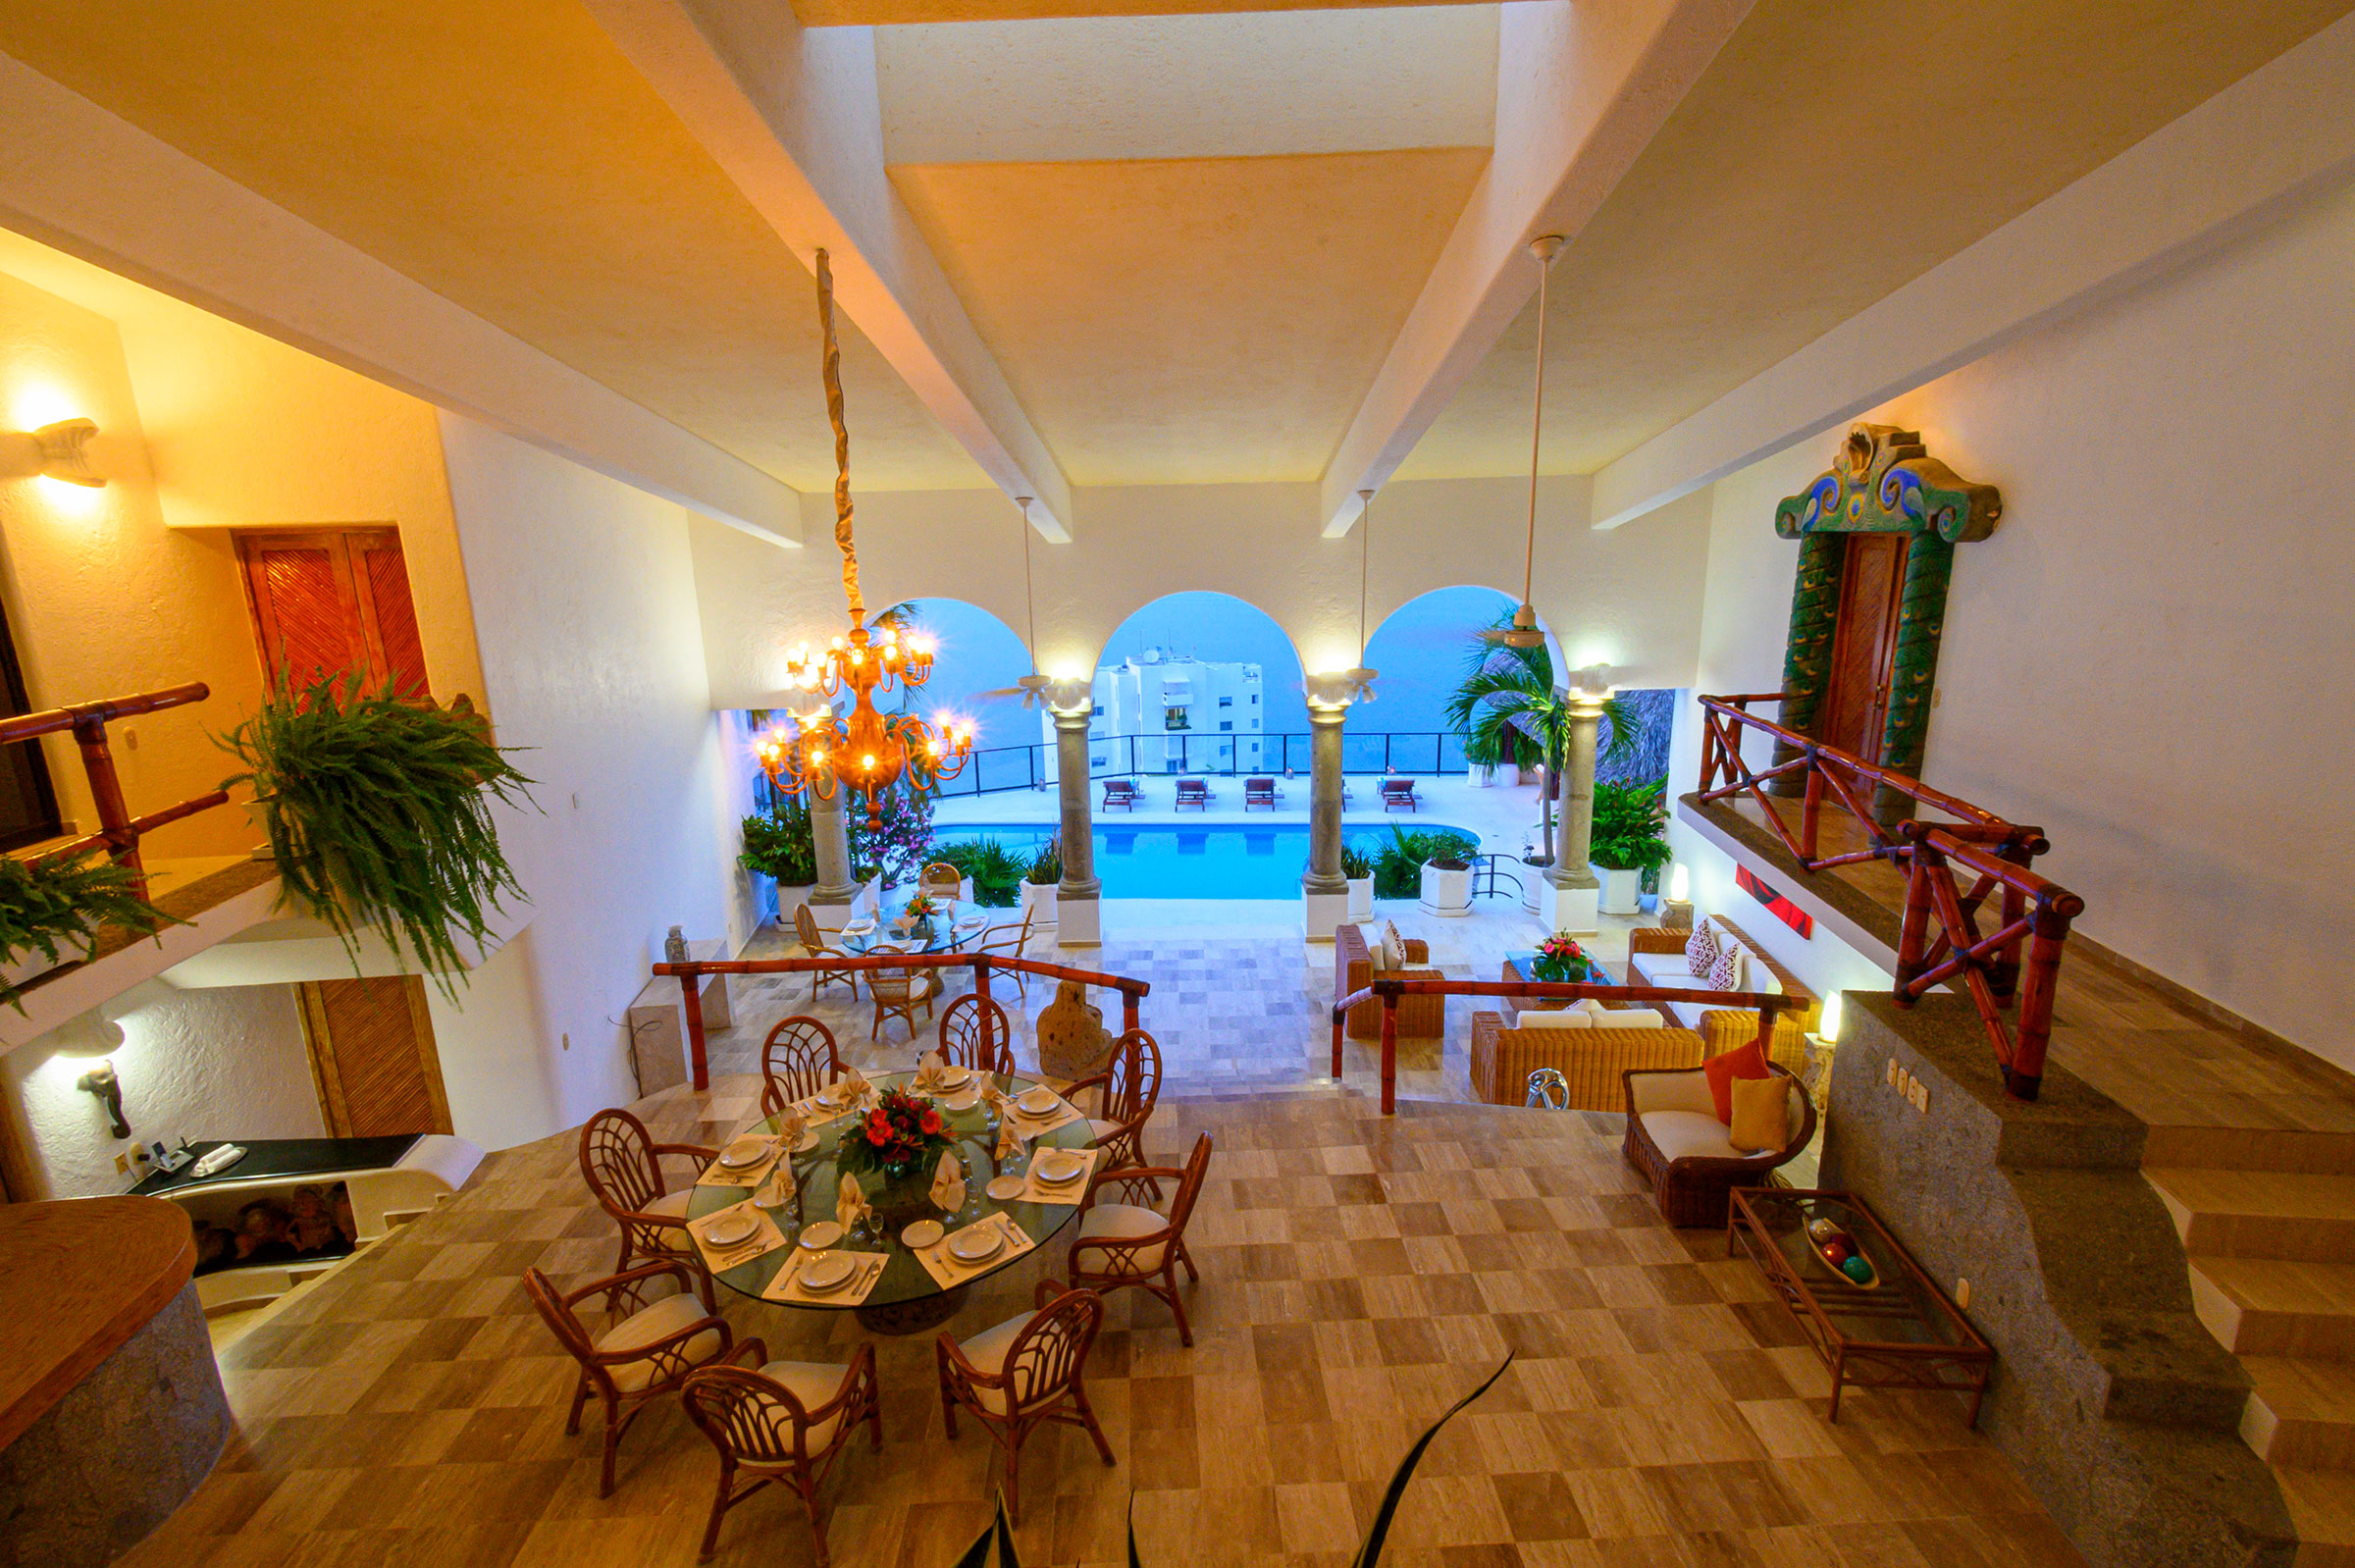 Interior at Casa Buenos Aires, Acapulco